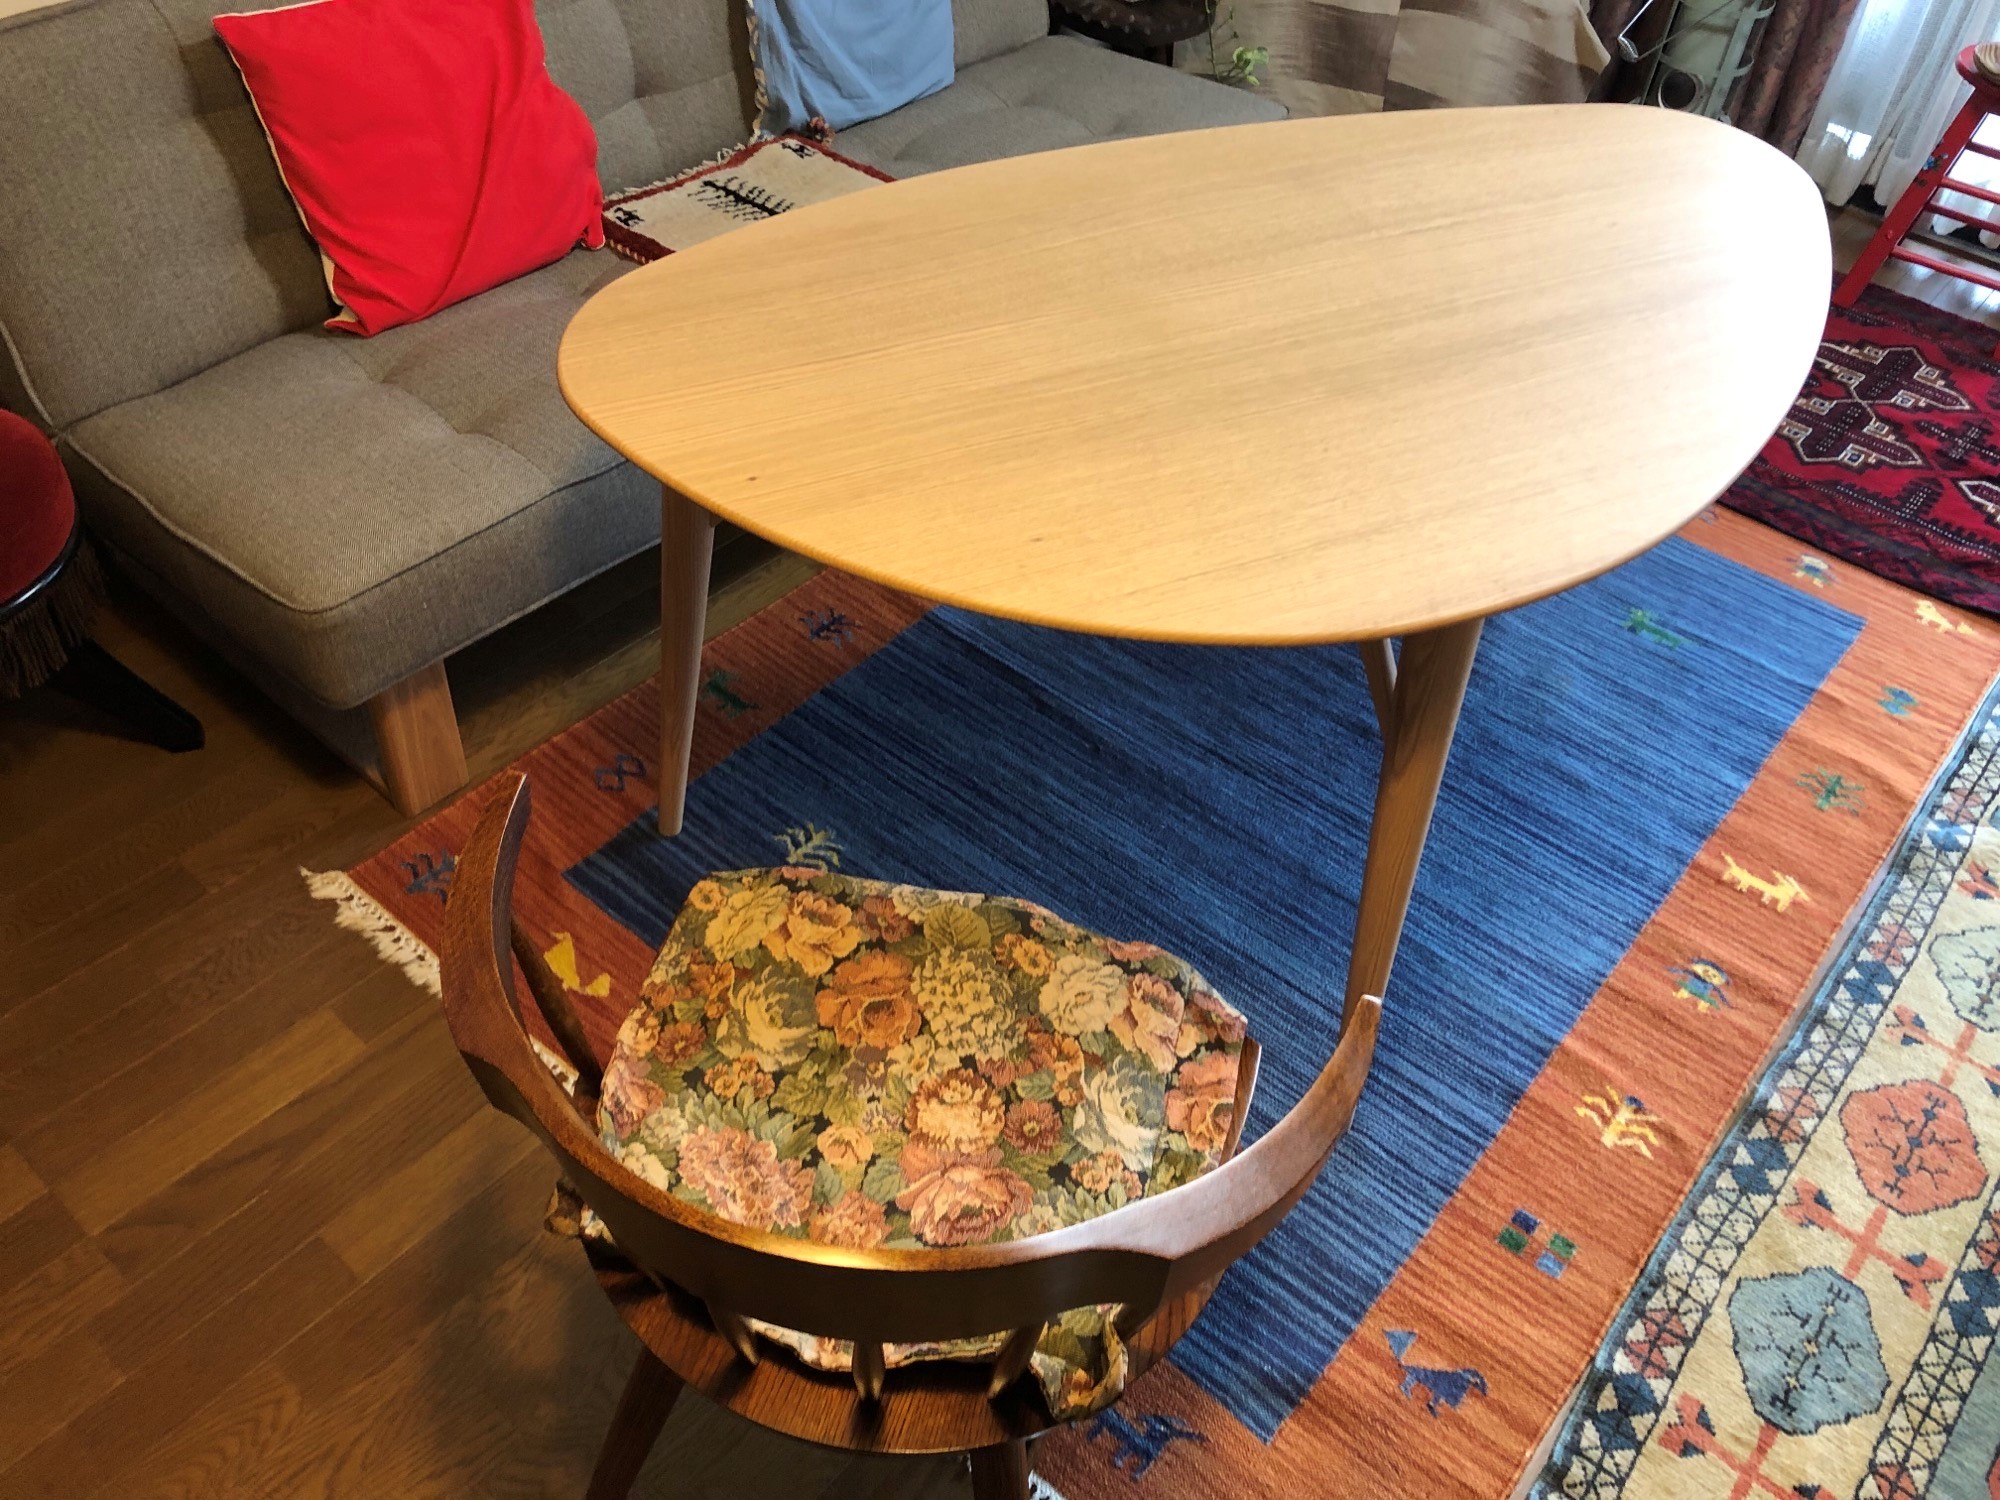 U様/クラウムダイニングテーブル